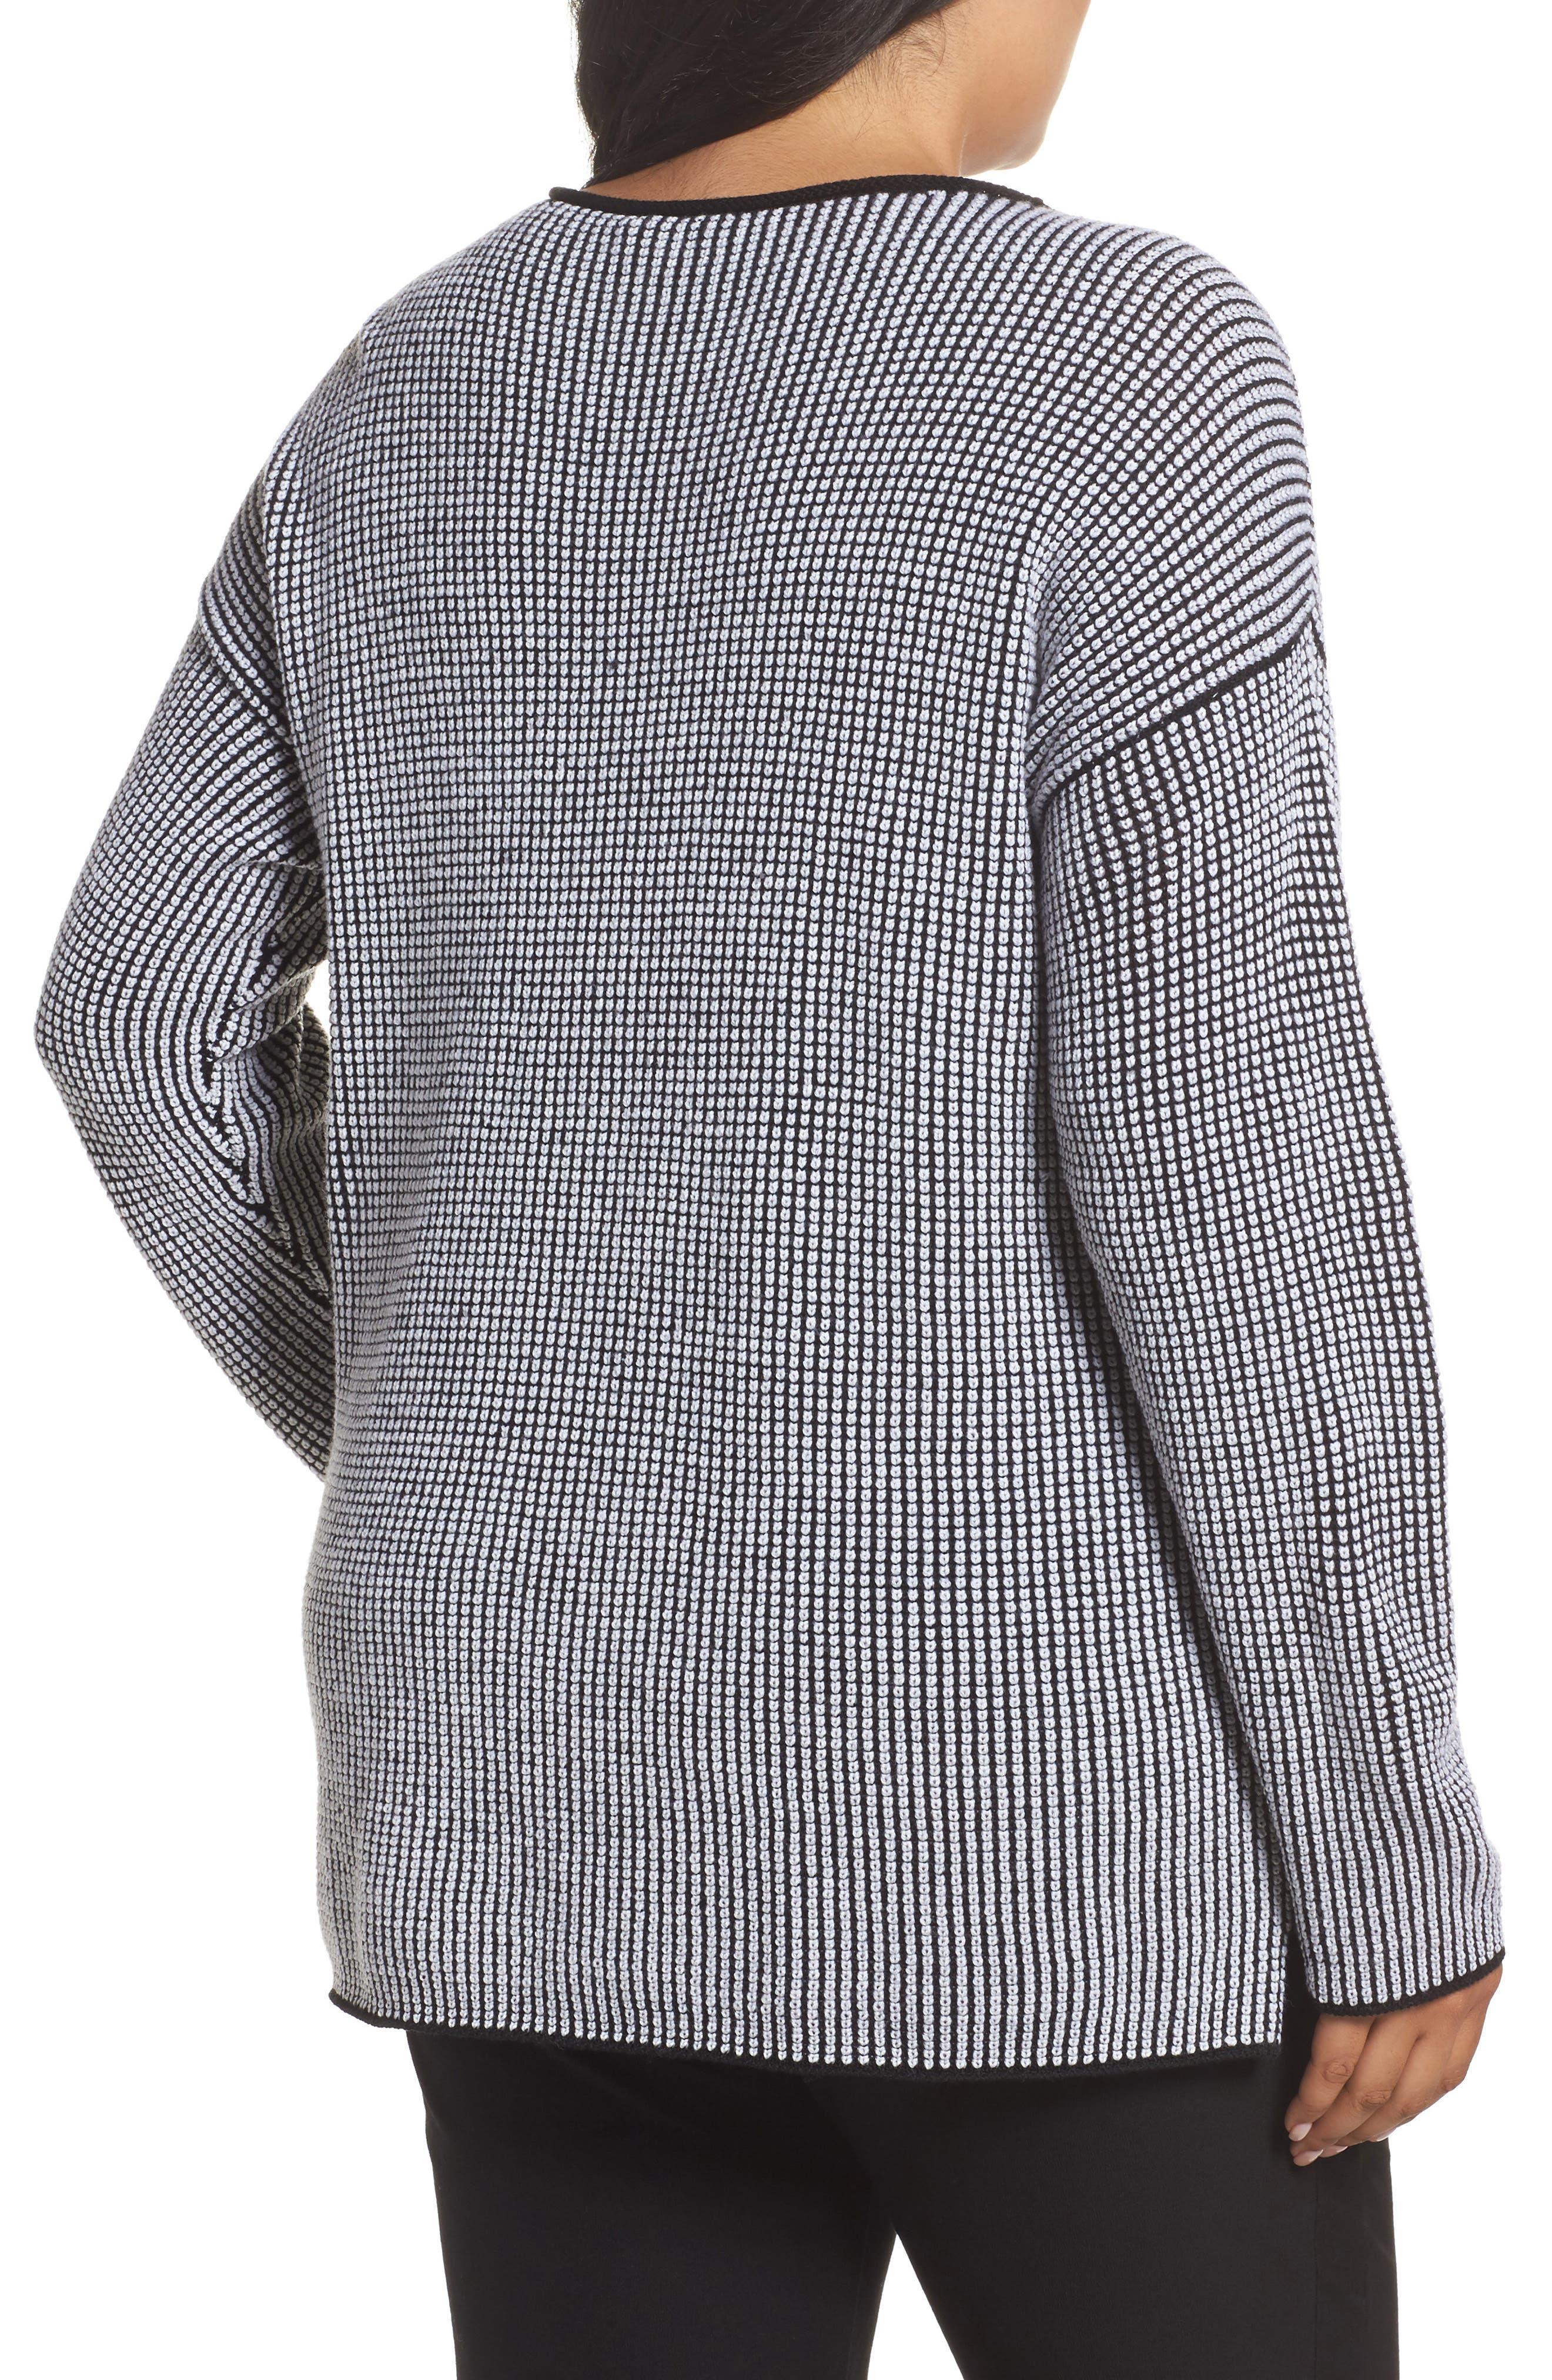 Alternate Image 2  - Eileen Fisher Textured Merino Wool Sweater (Plus Size)